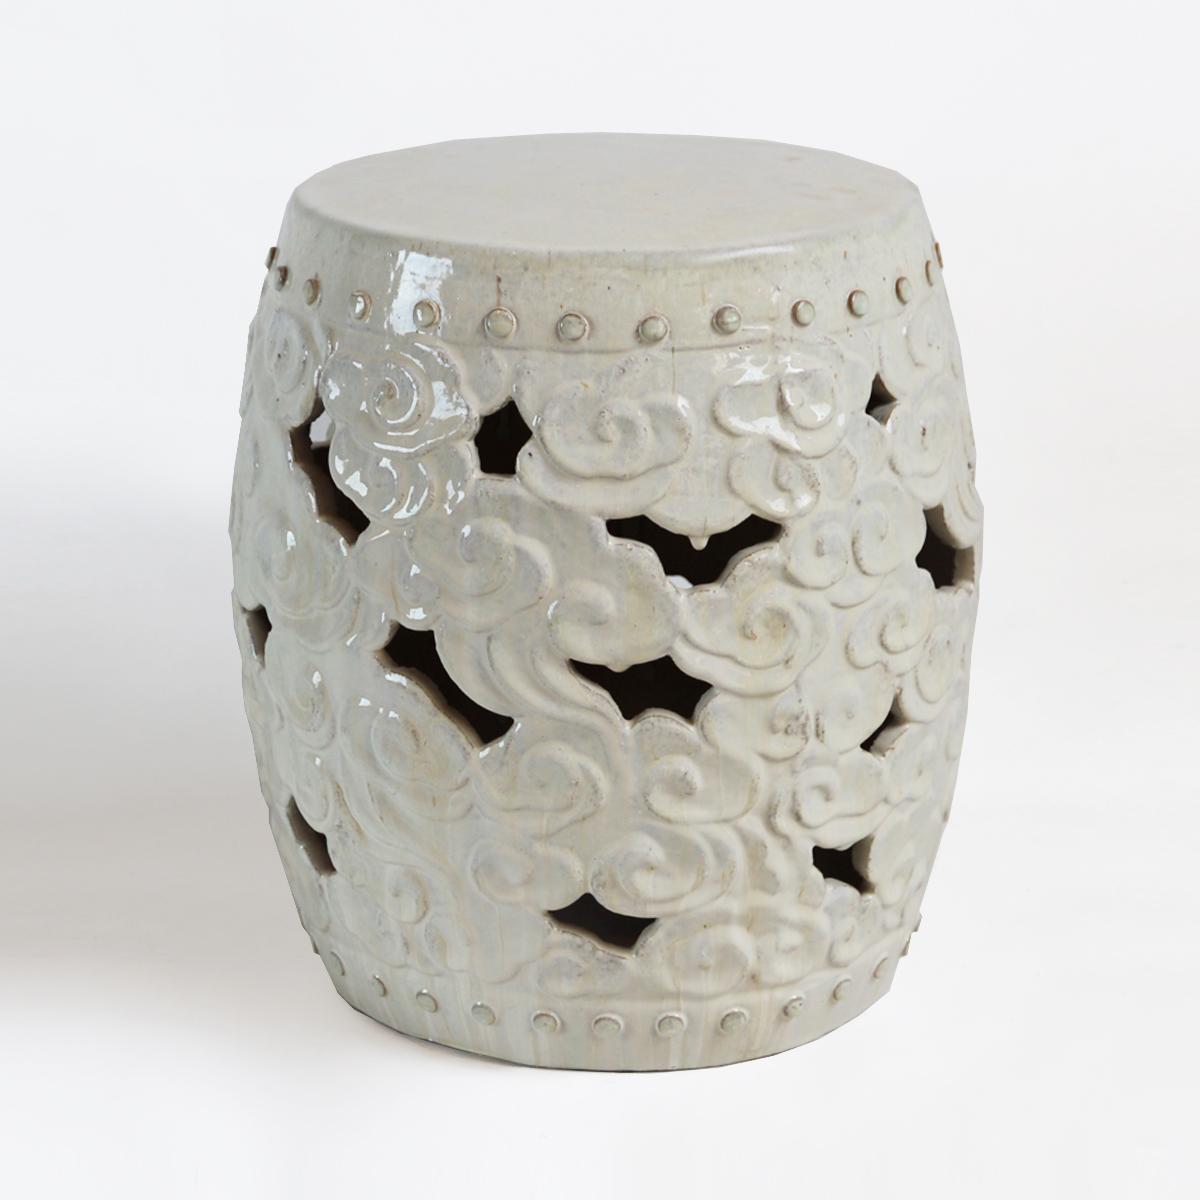 White Ceramic Barrel Cloud Garden Stool Furniture Mix